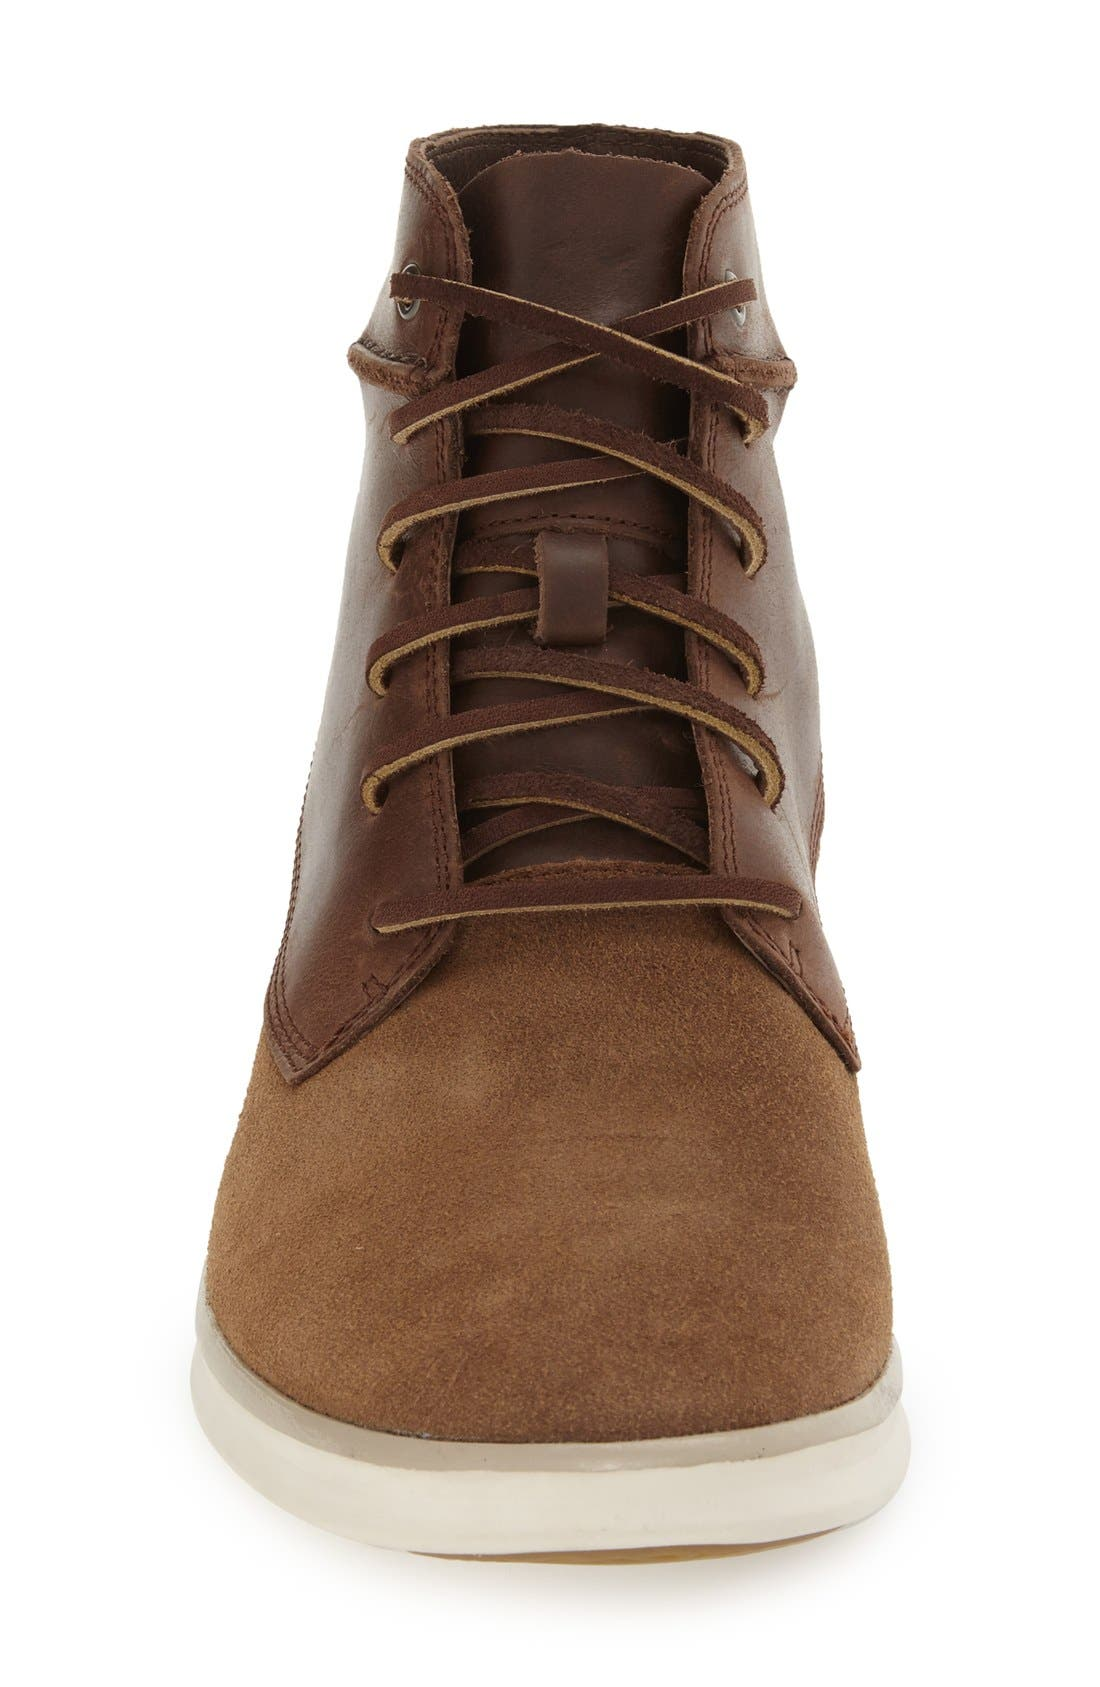 'Lamont' High Top Sneaker,                             Alternate thumbnail 3, color,